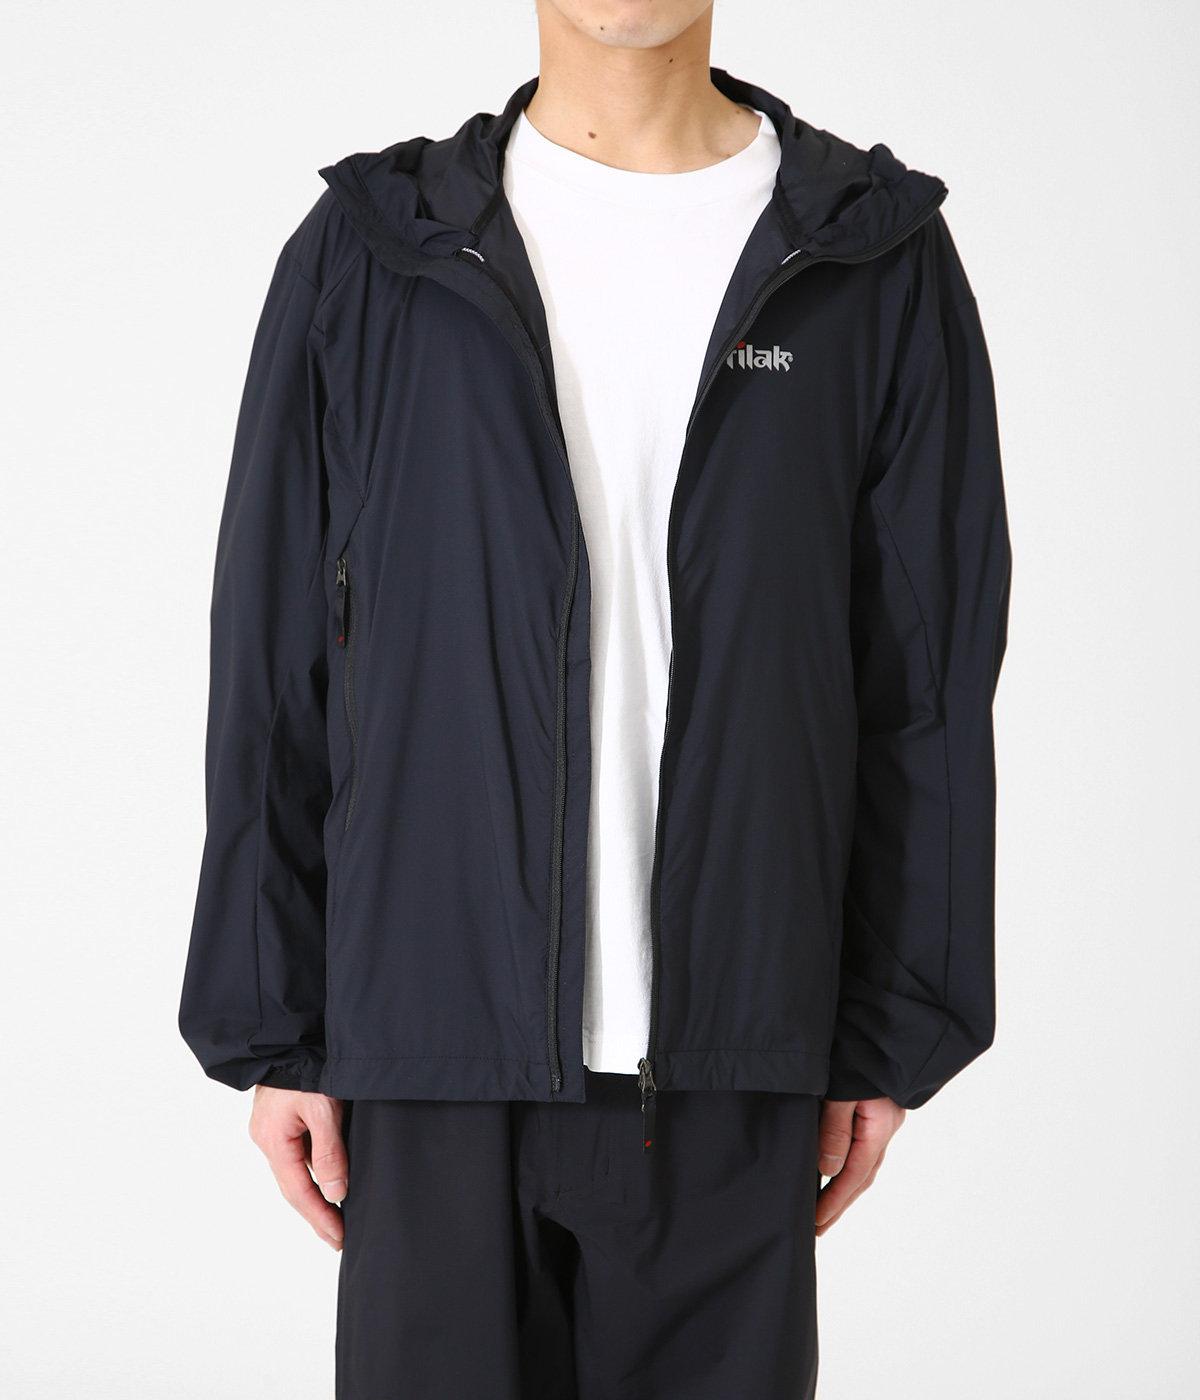 Tind Jacket